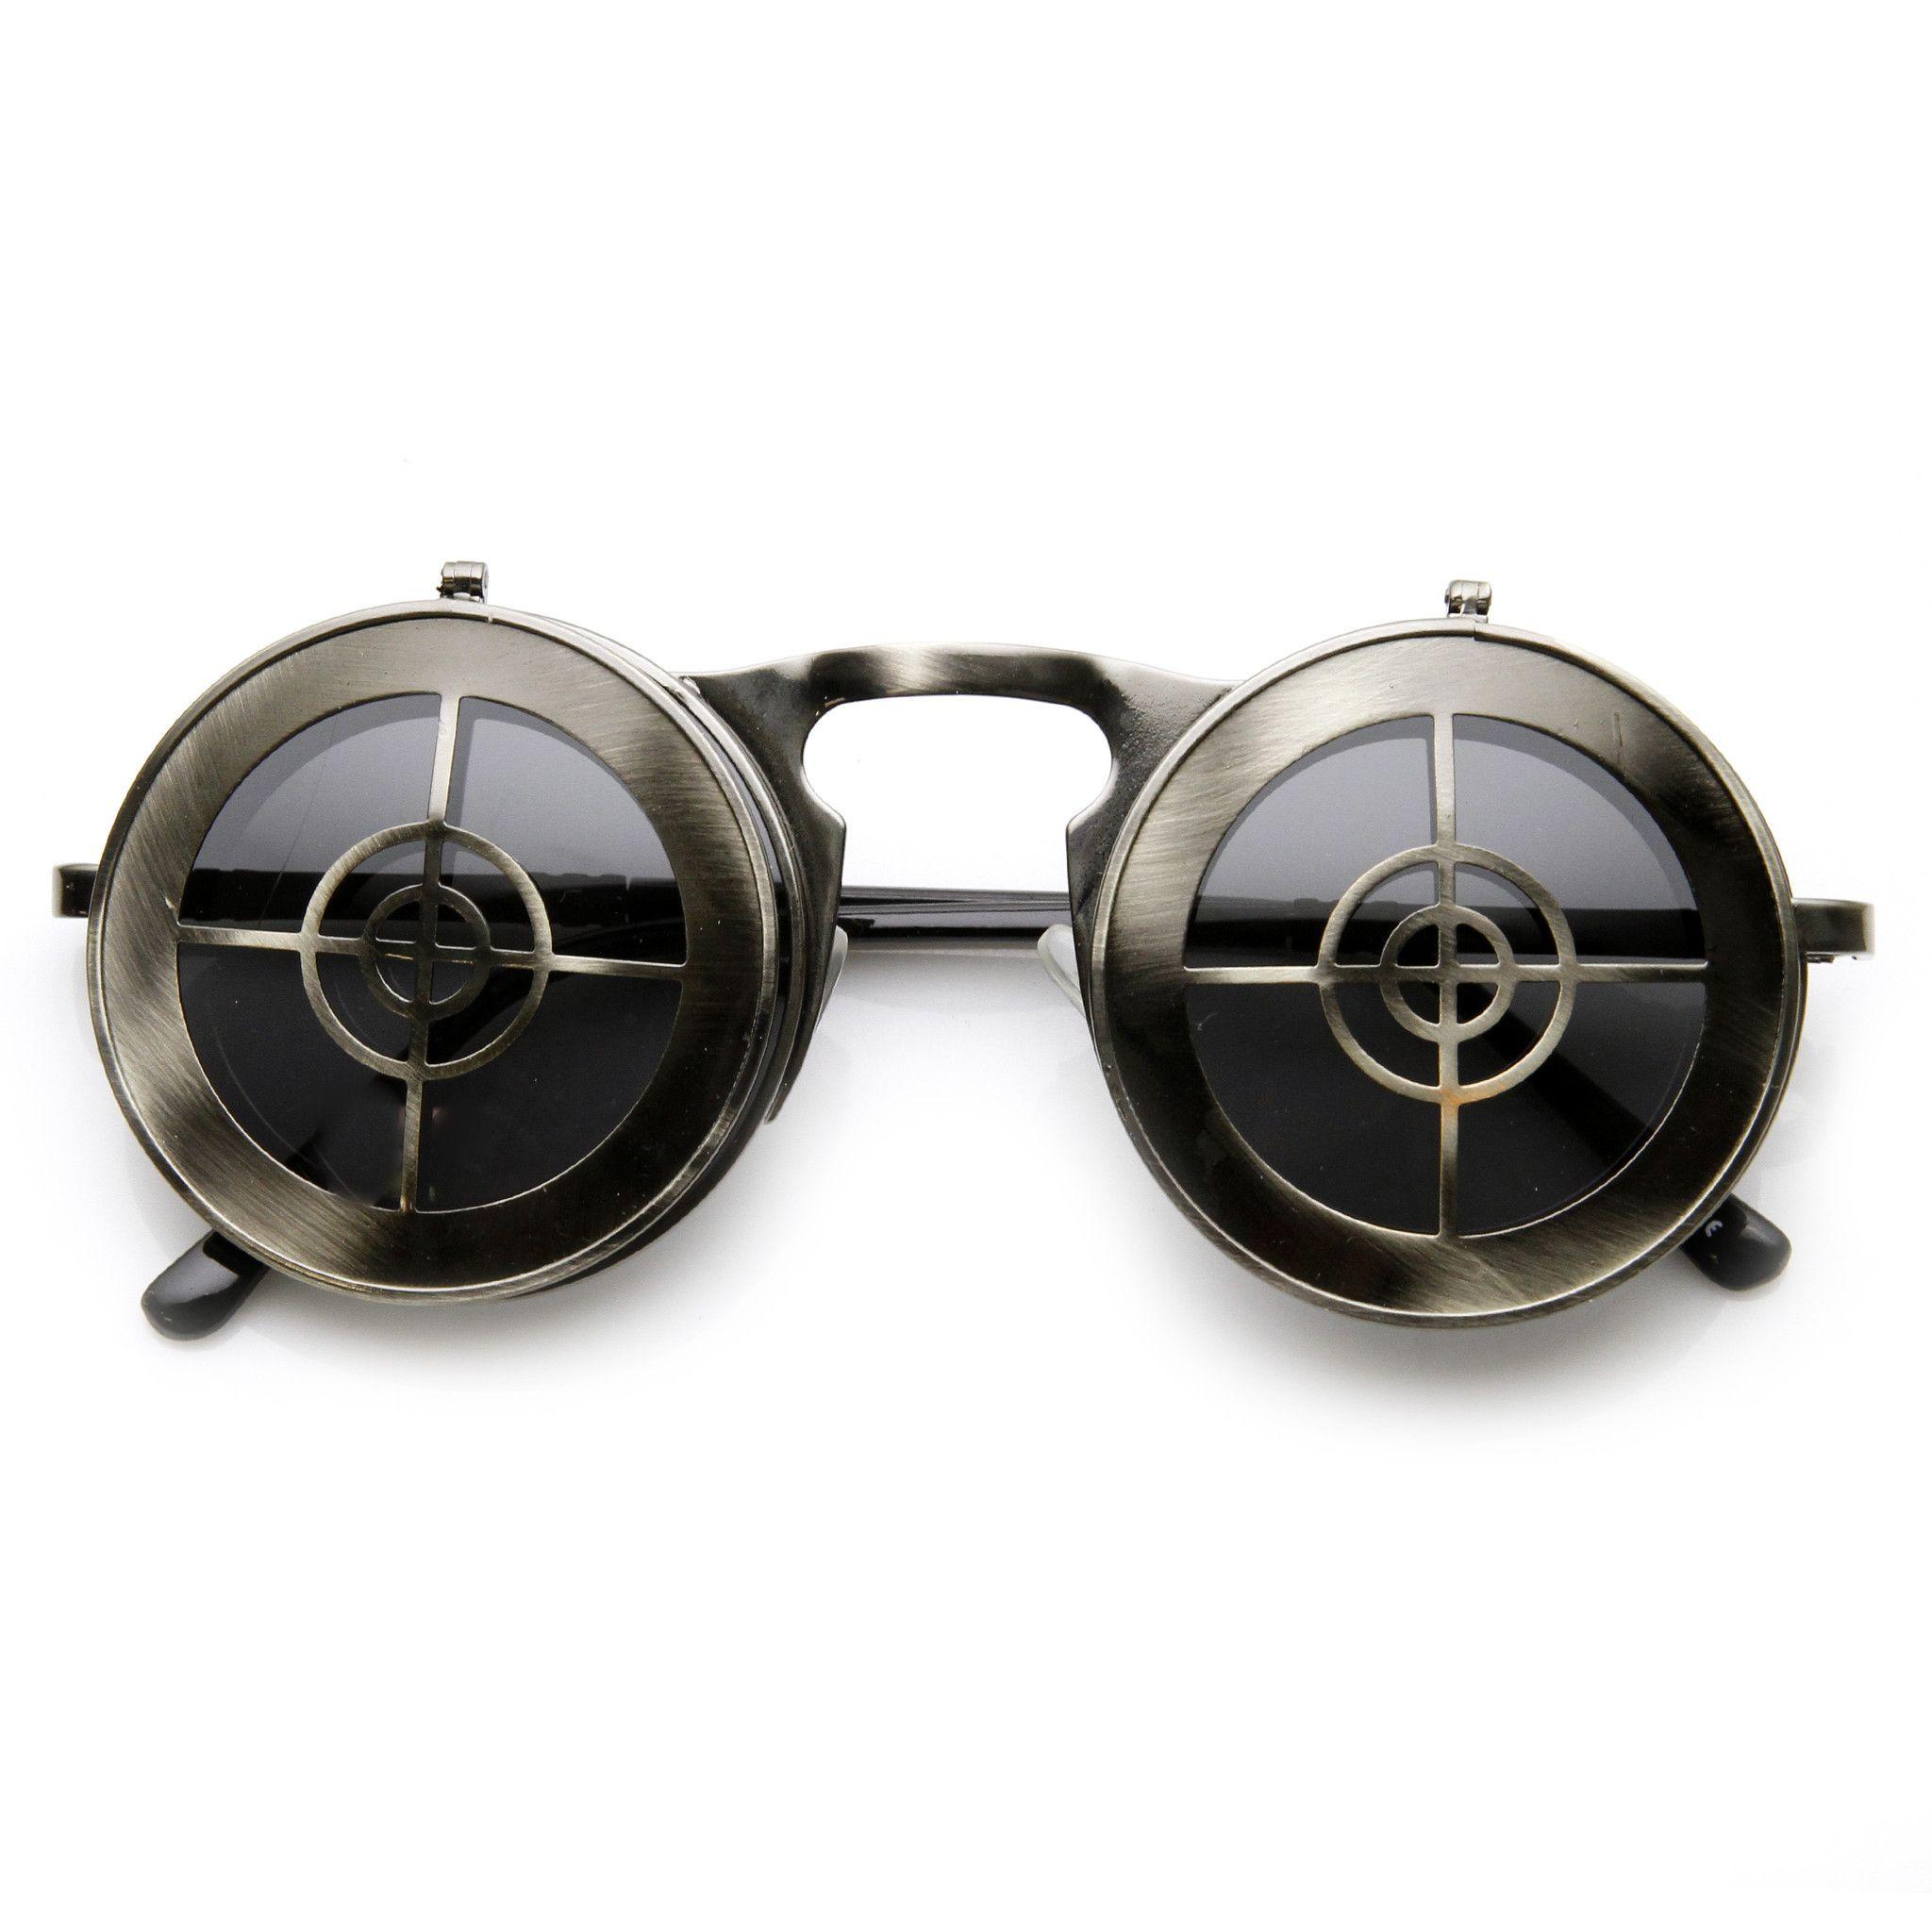 Unique Full Metal Flip Up Bulls Eye Crosshair Target Steampunk Sunglasses 9346 from zeroUV